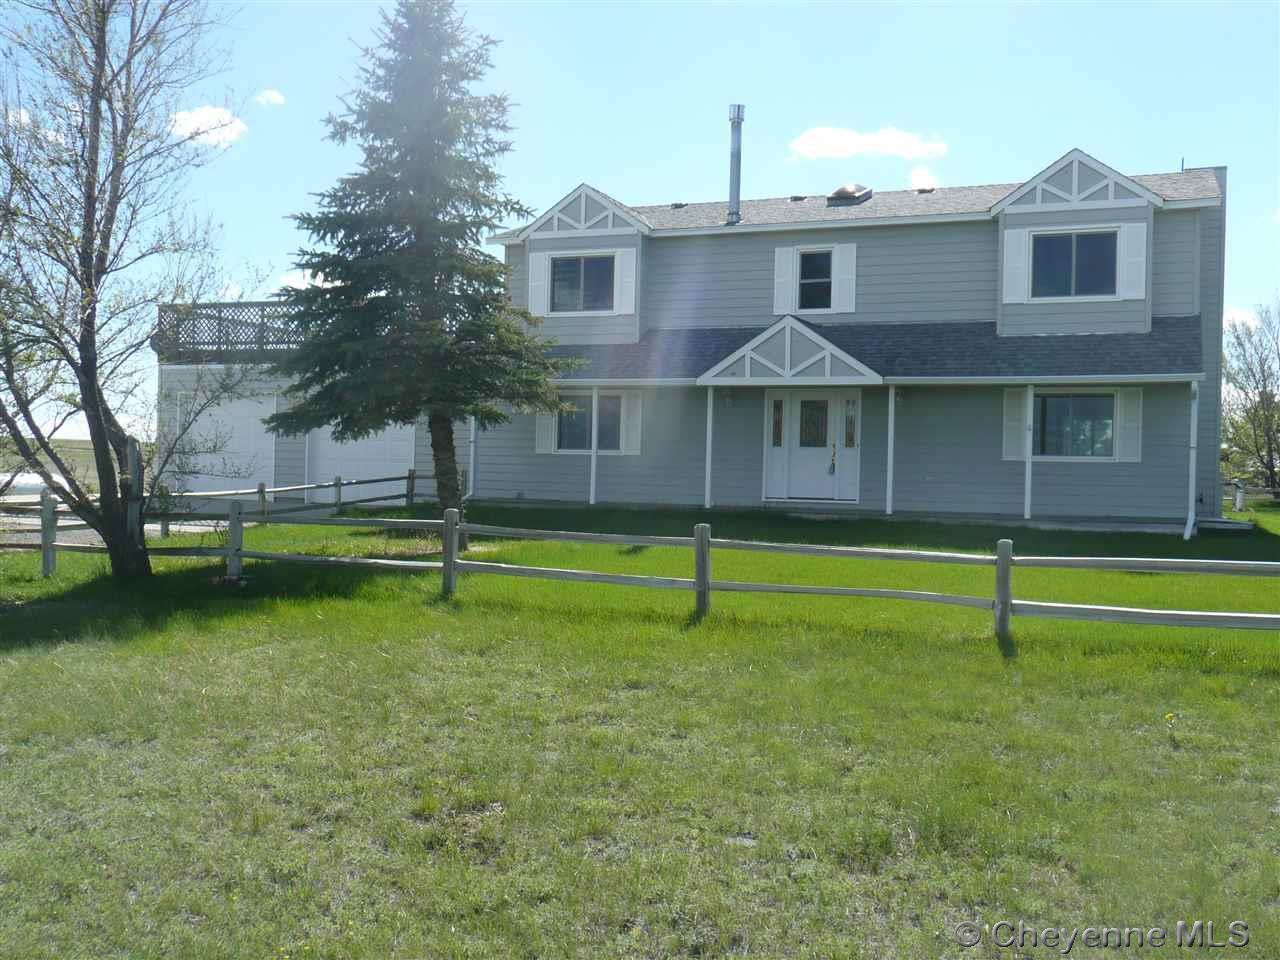 160 ROSETTA LN, Cheyenne, WY, 82007 Primary Photo